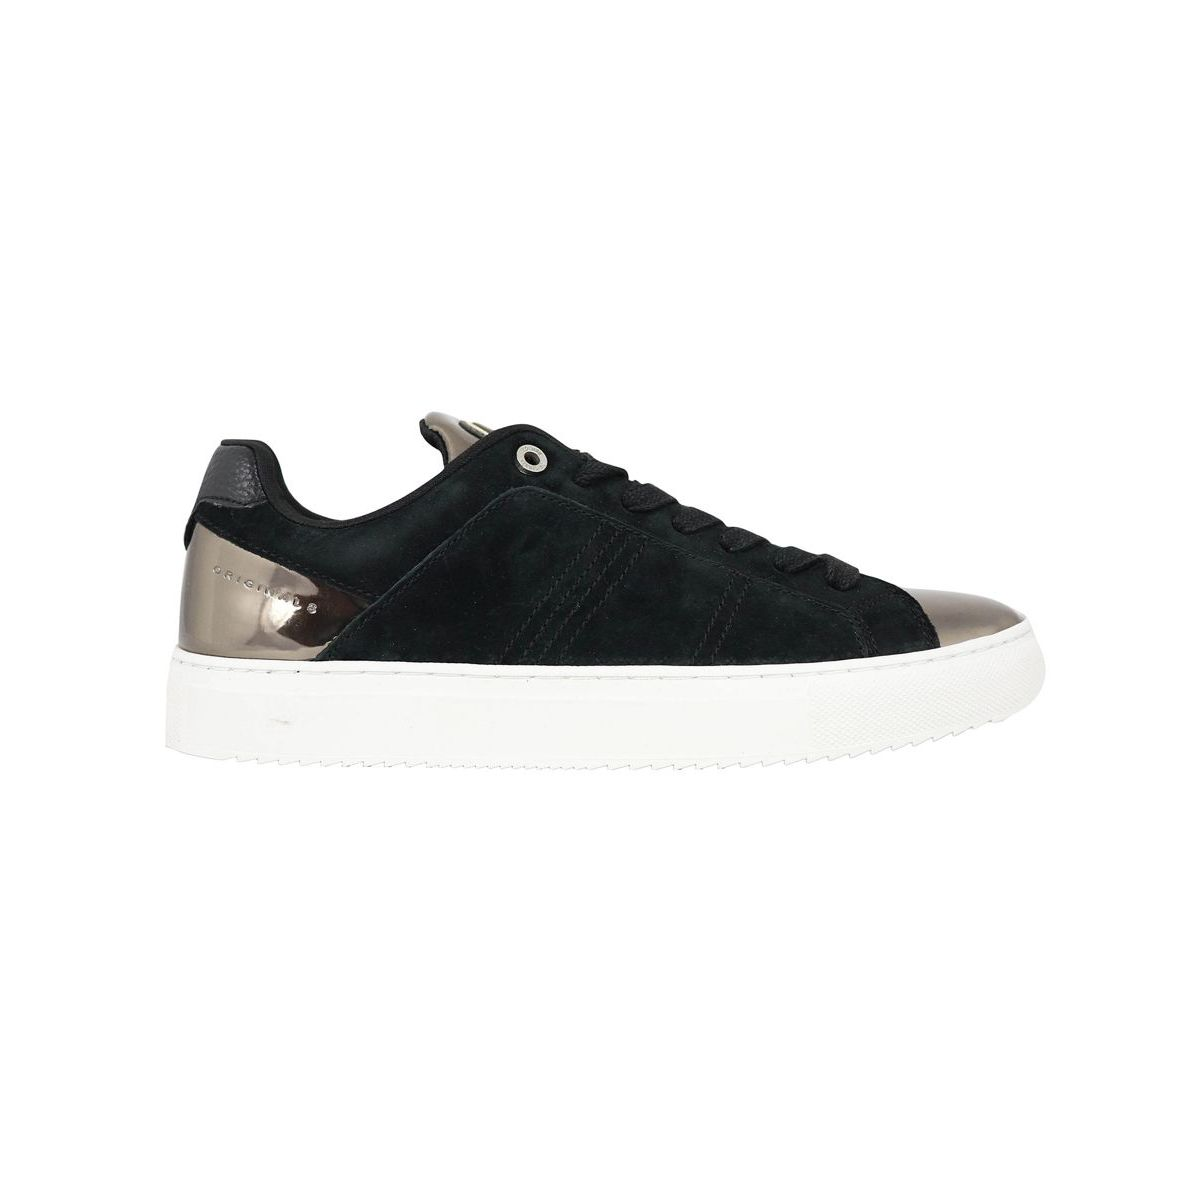 BRADBURY LUX sneakers Black Colmar Shoes